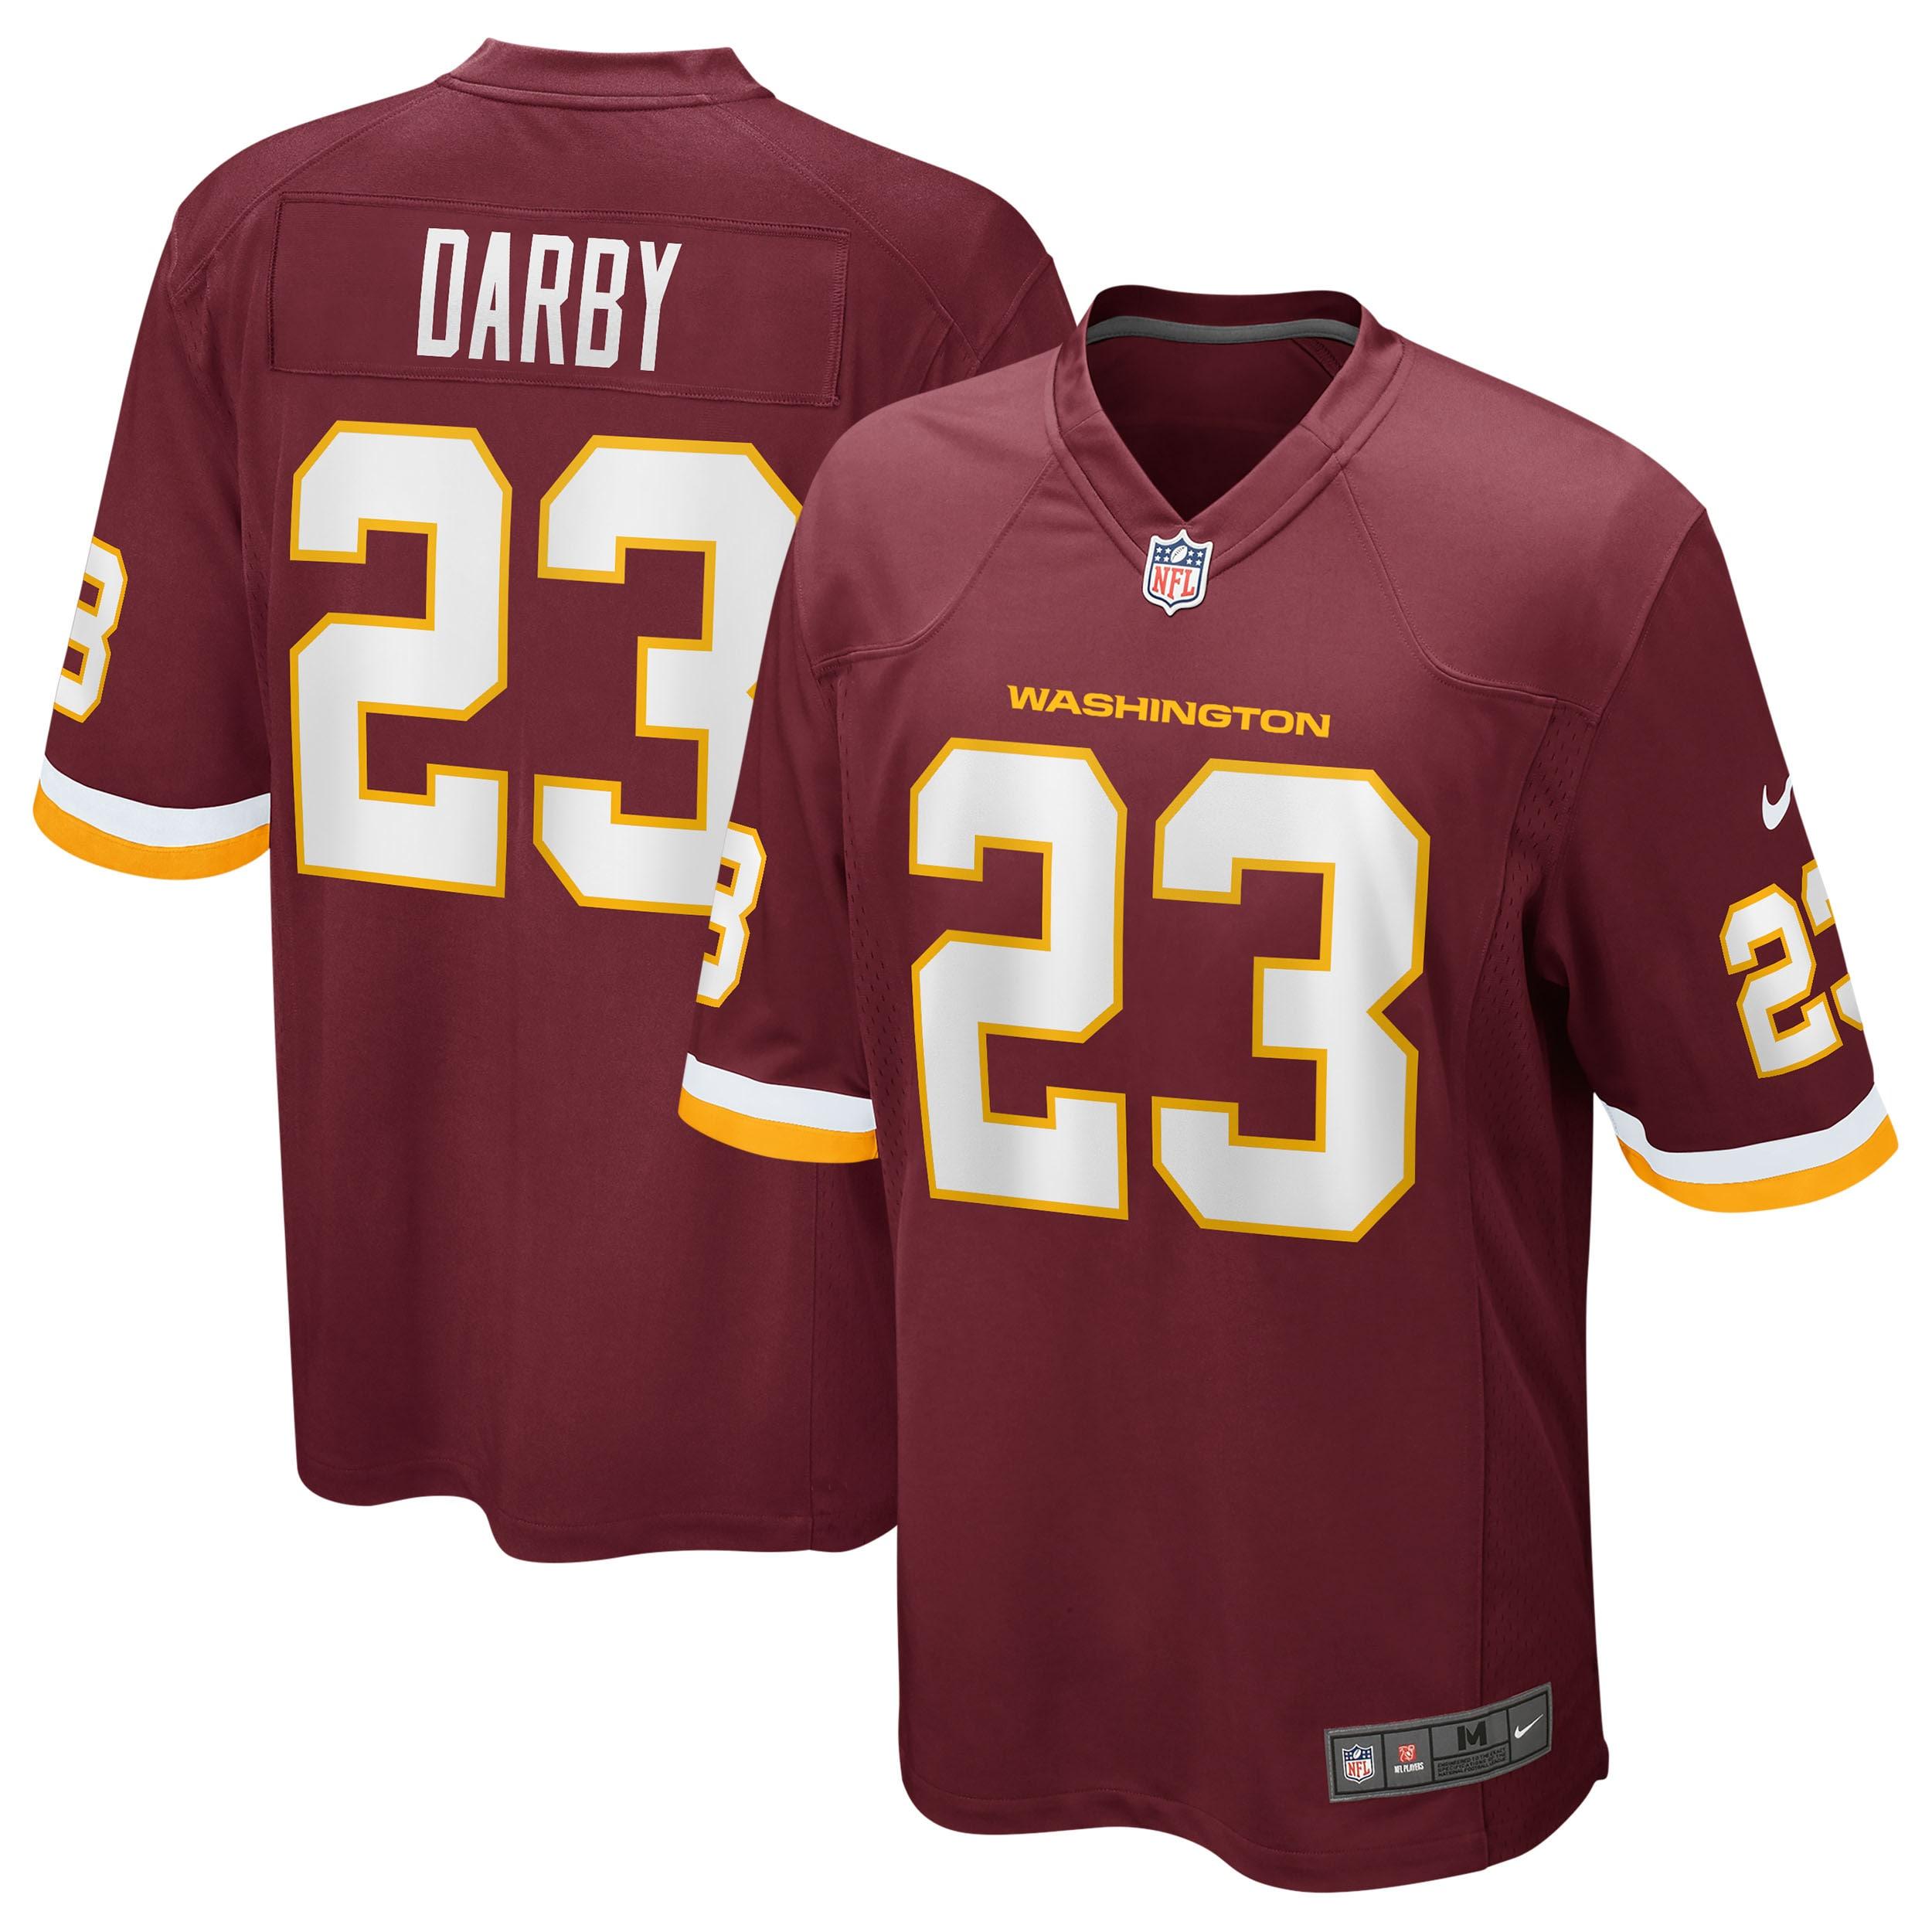 Ronald Darby Washington Football Team Nike Team Game Jersey - Burgundy - Walmart.com